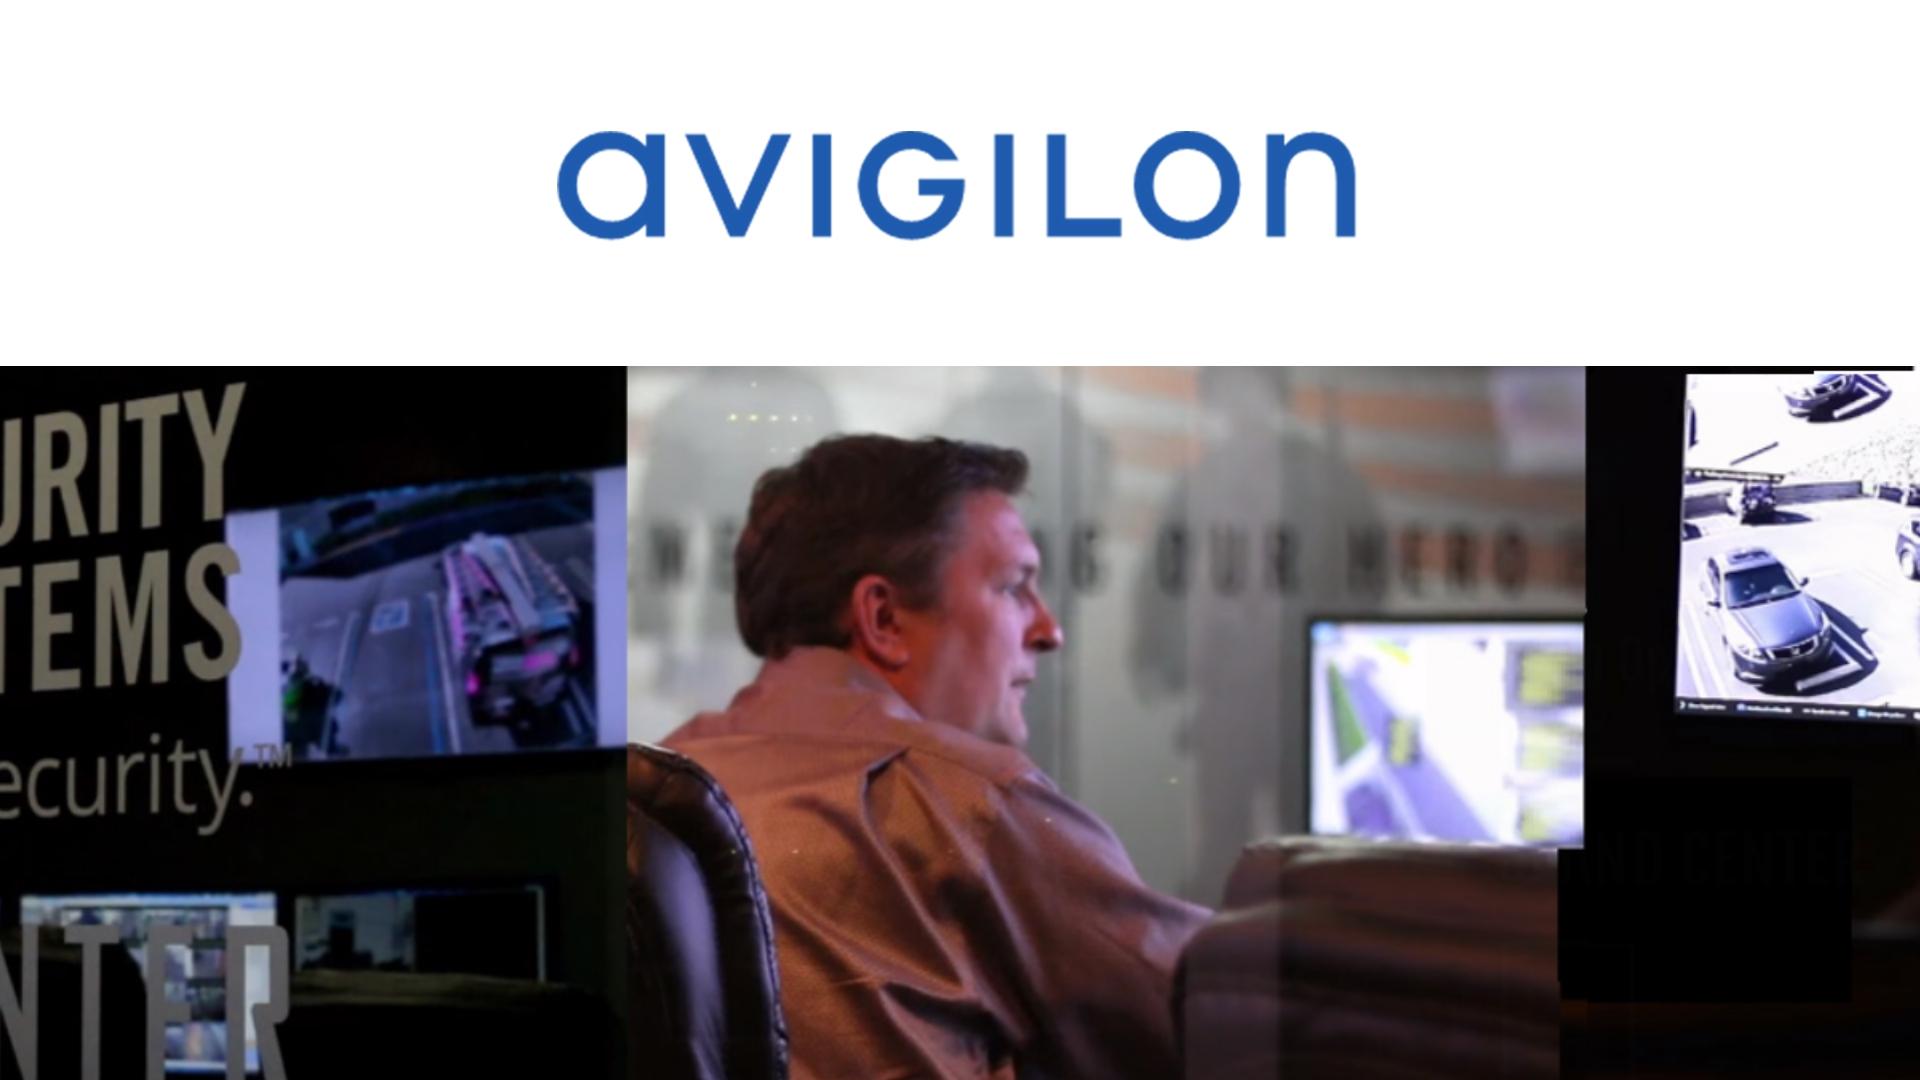 Avigilion_Video_Control_JMG